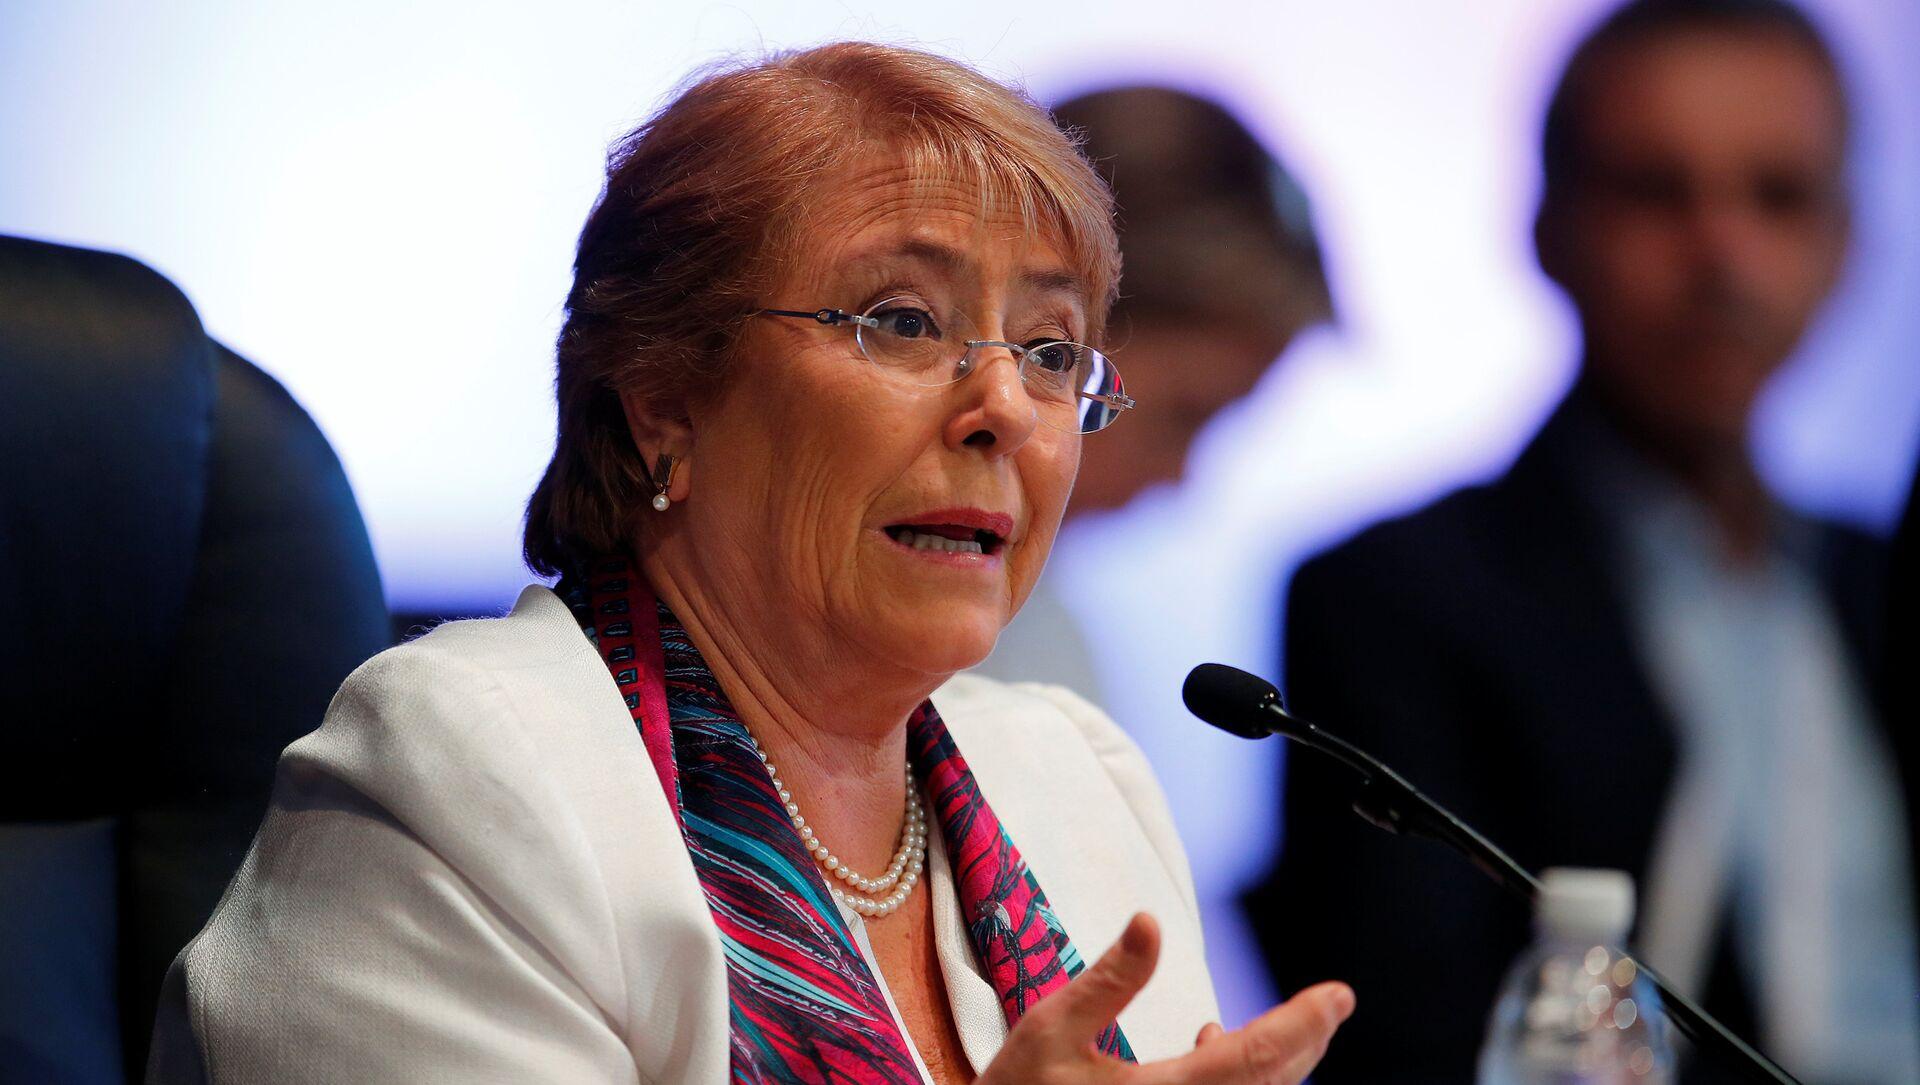 Michelle Bachelet, la Alta Comisionada de la ONU para los DDHH - Sputnik Mundo, 1920, 08.10.2020